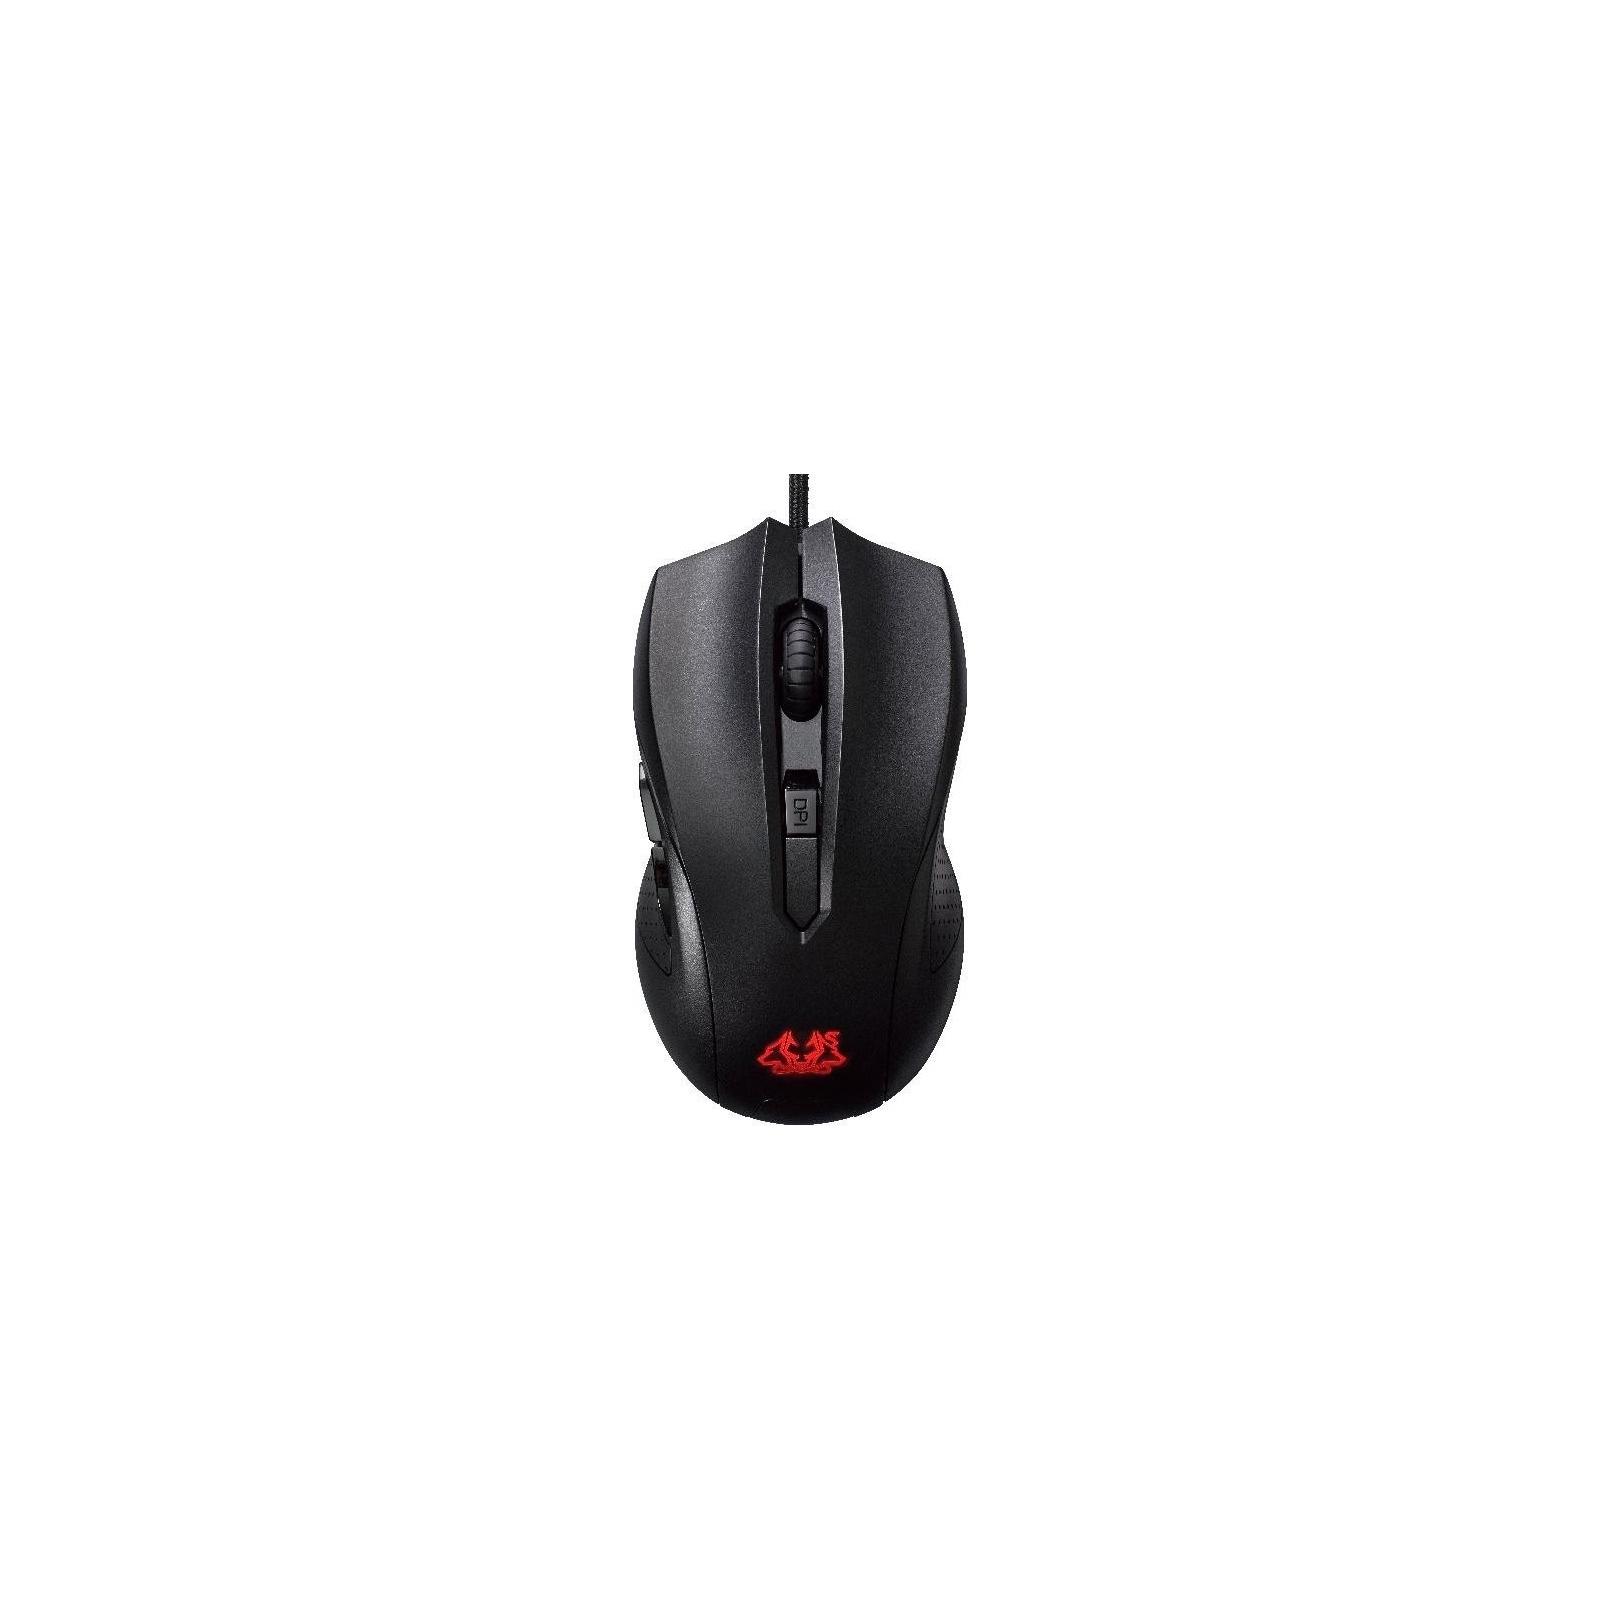 Мышка ASUS ROG Cerberus USB (90YH00Q1-BAUA00) изображение 2